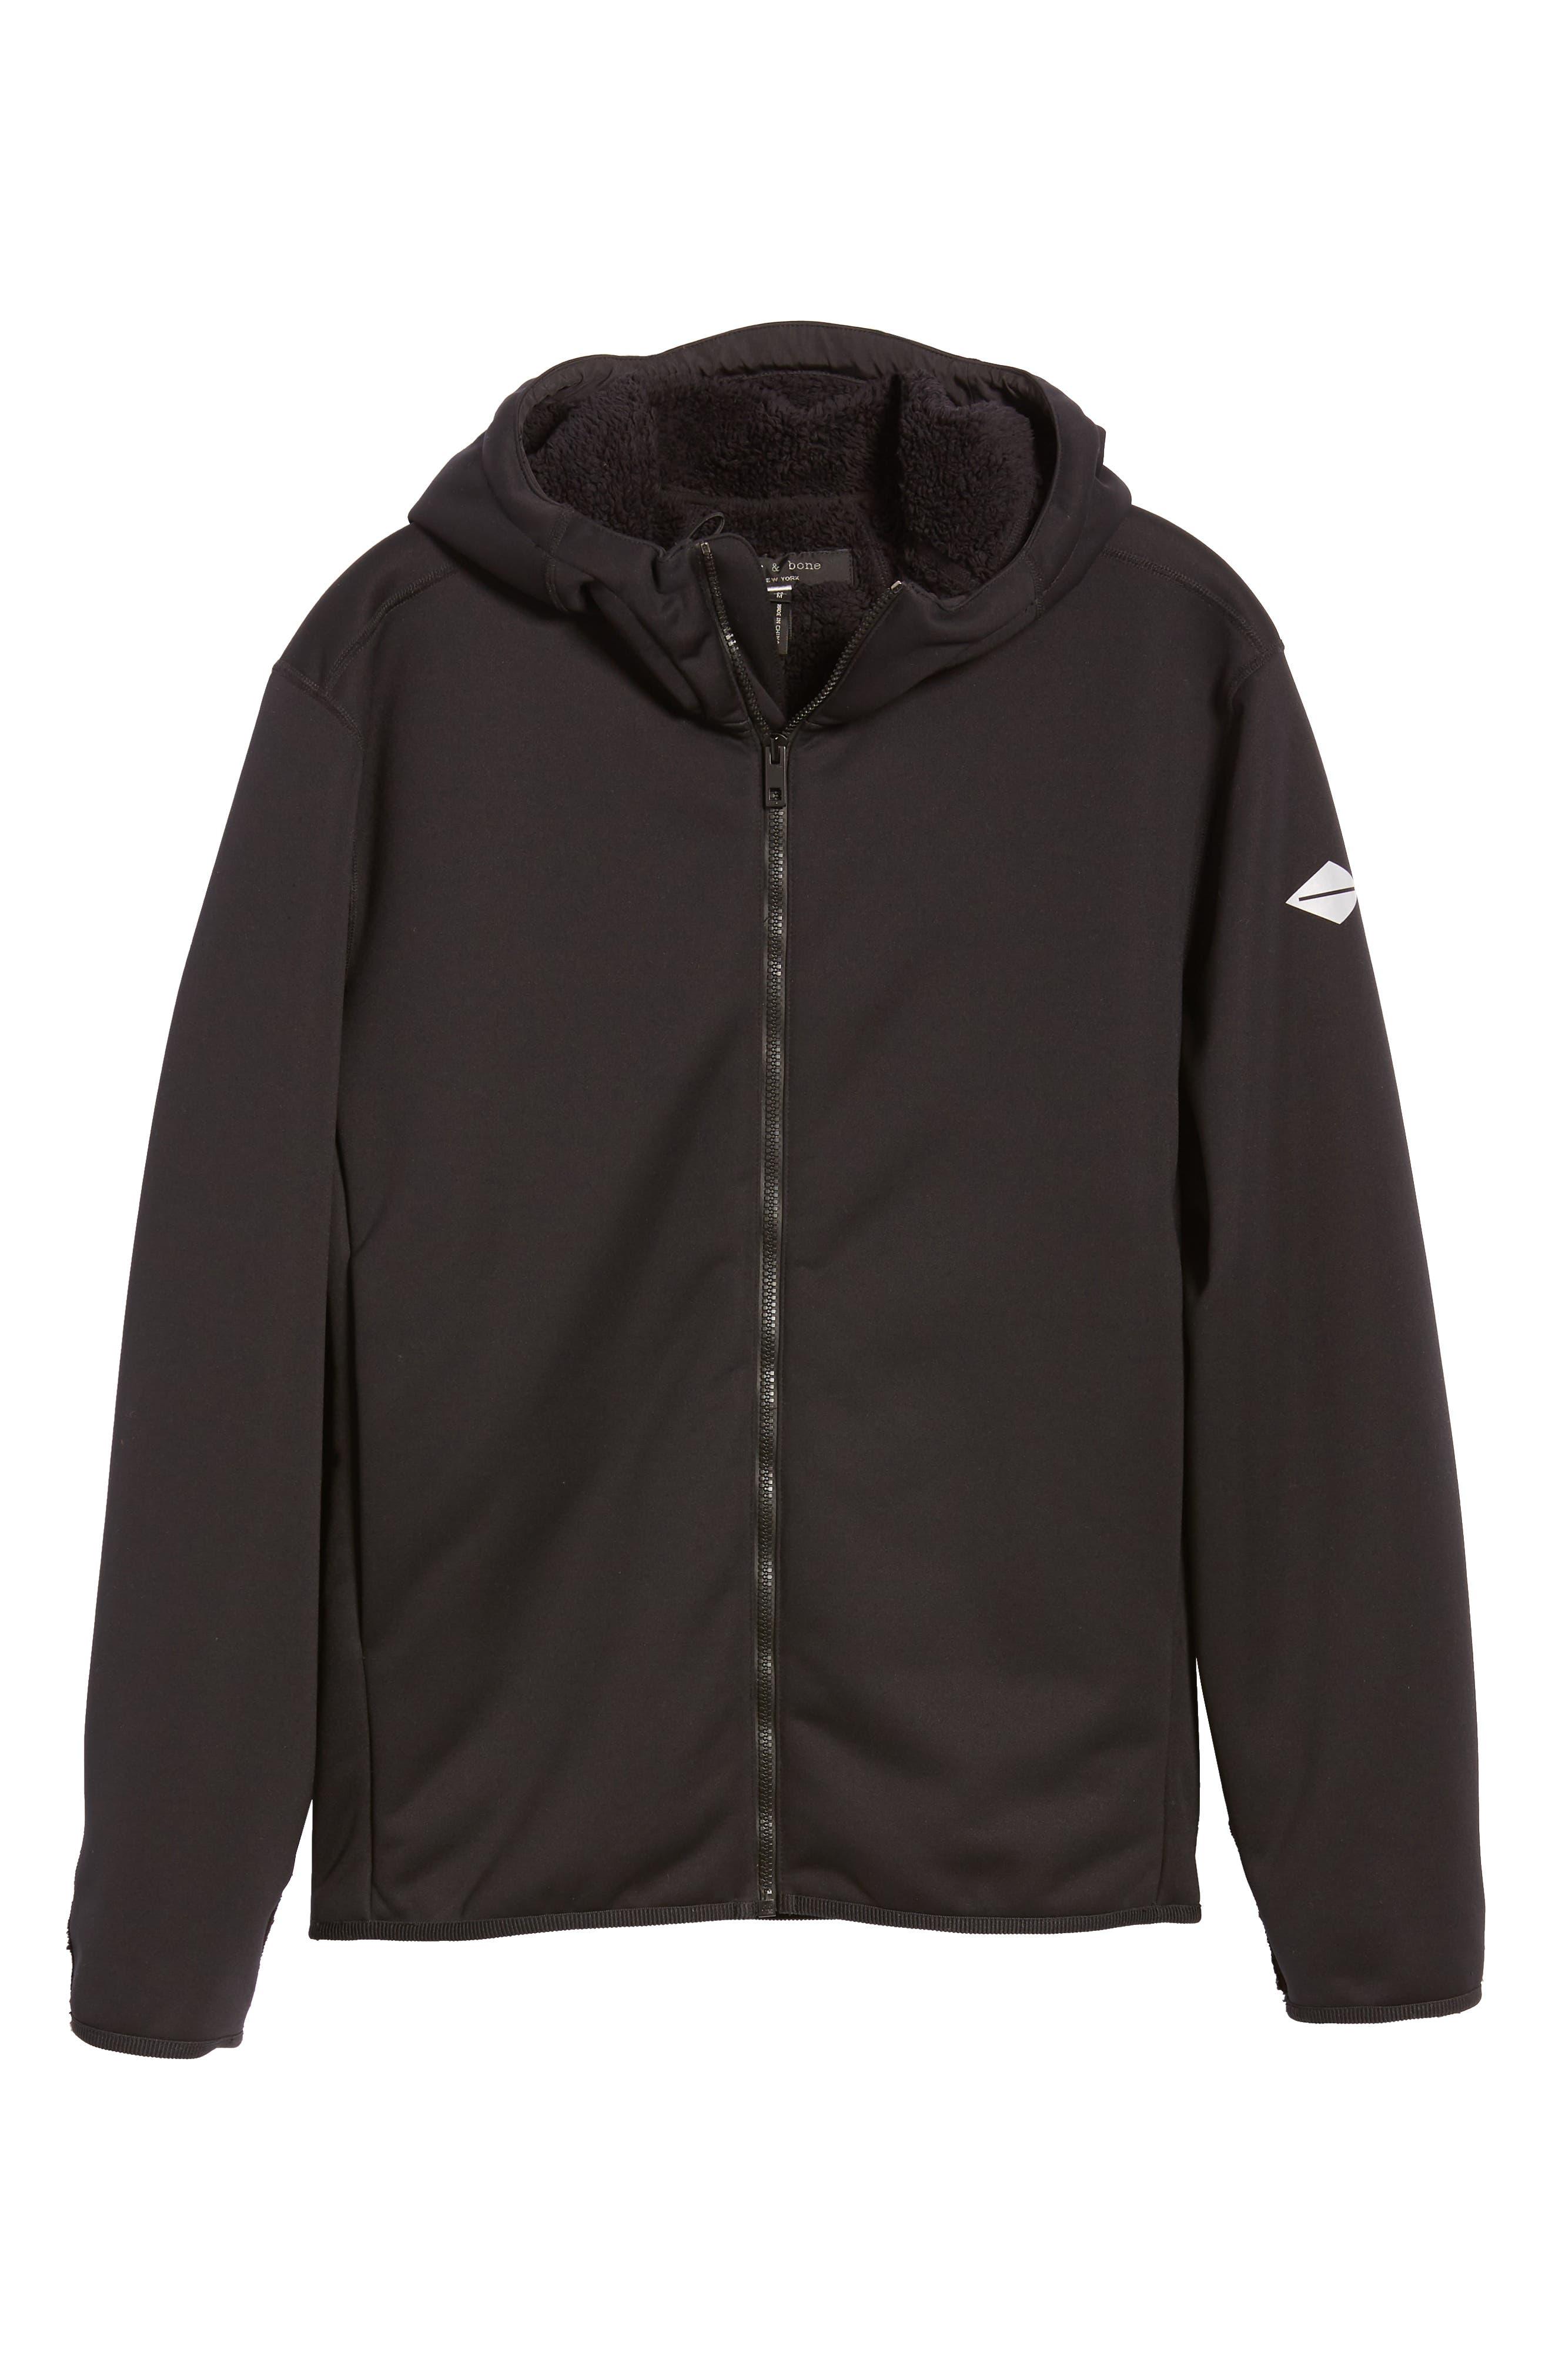 Tactic Hooded Fleece Jacket,                             Alternate thumbnail 6, color,                             BLACK